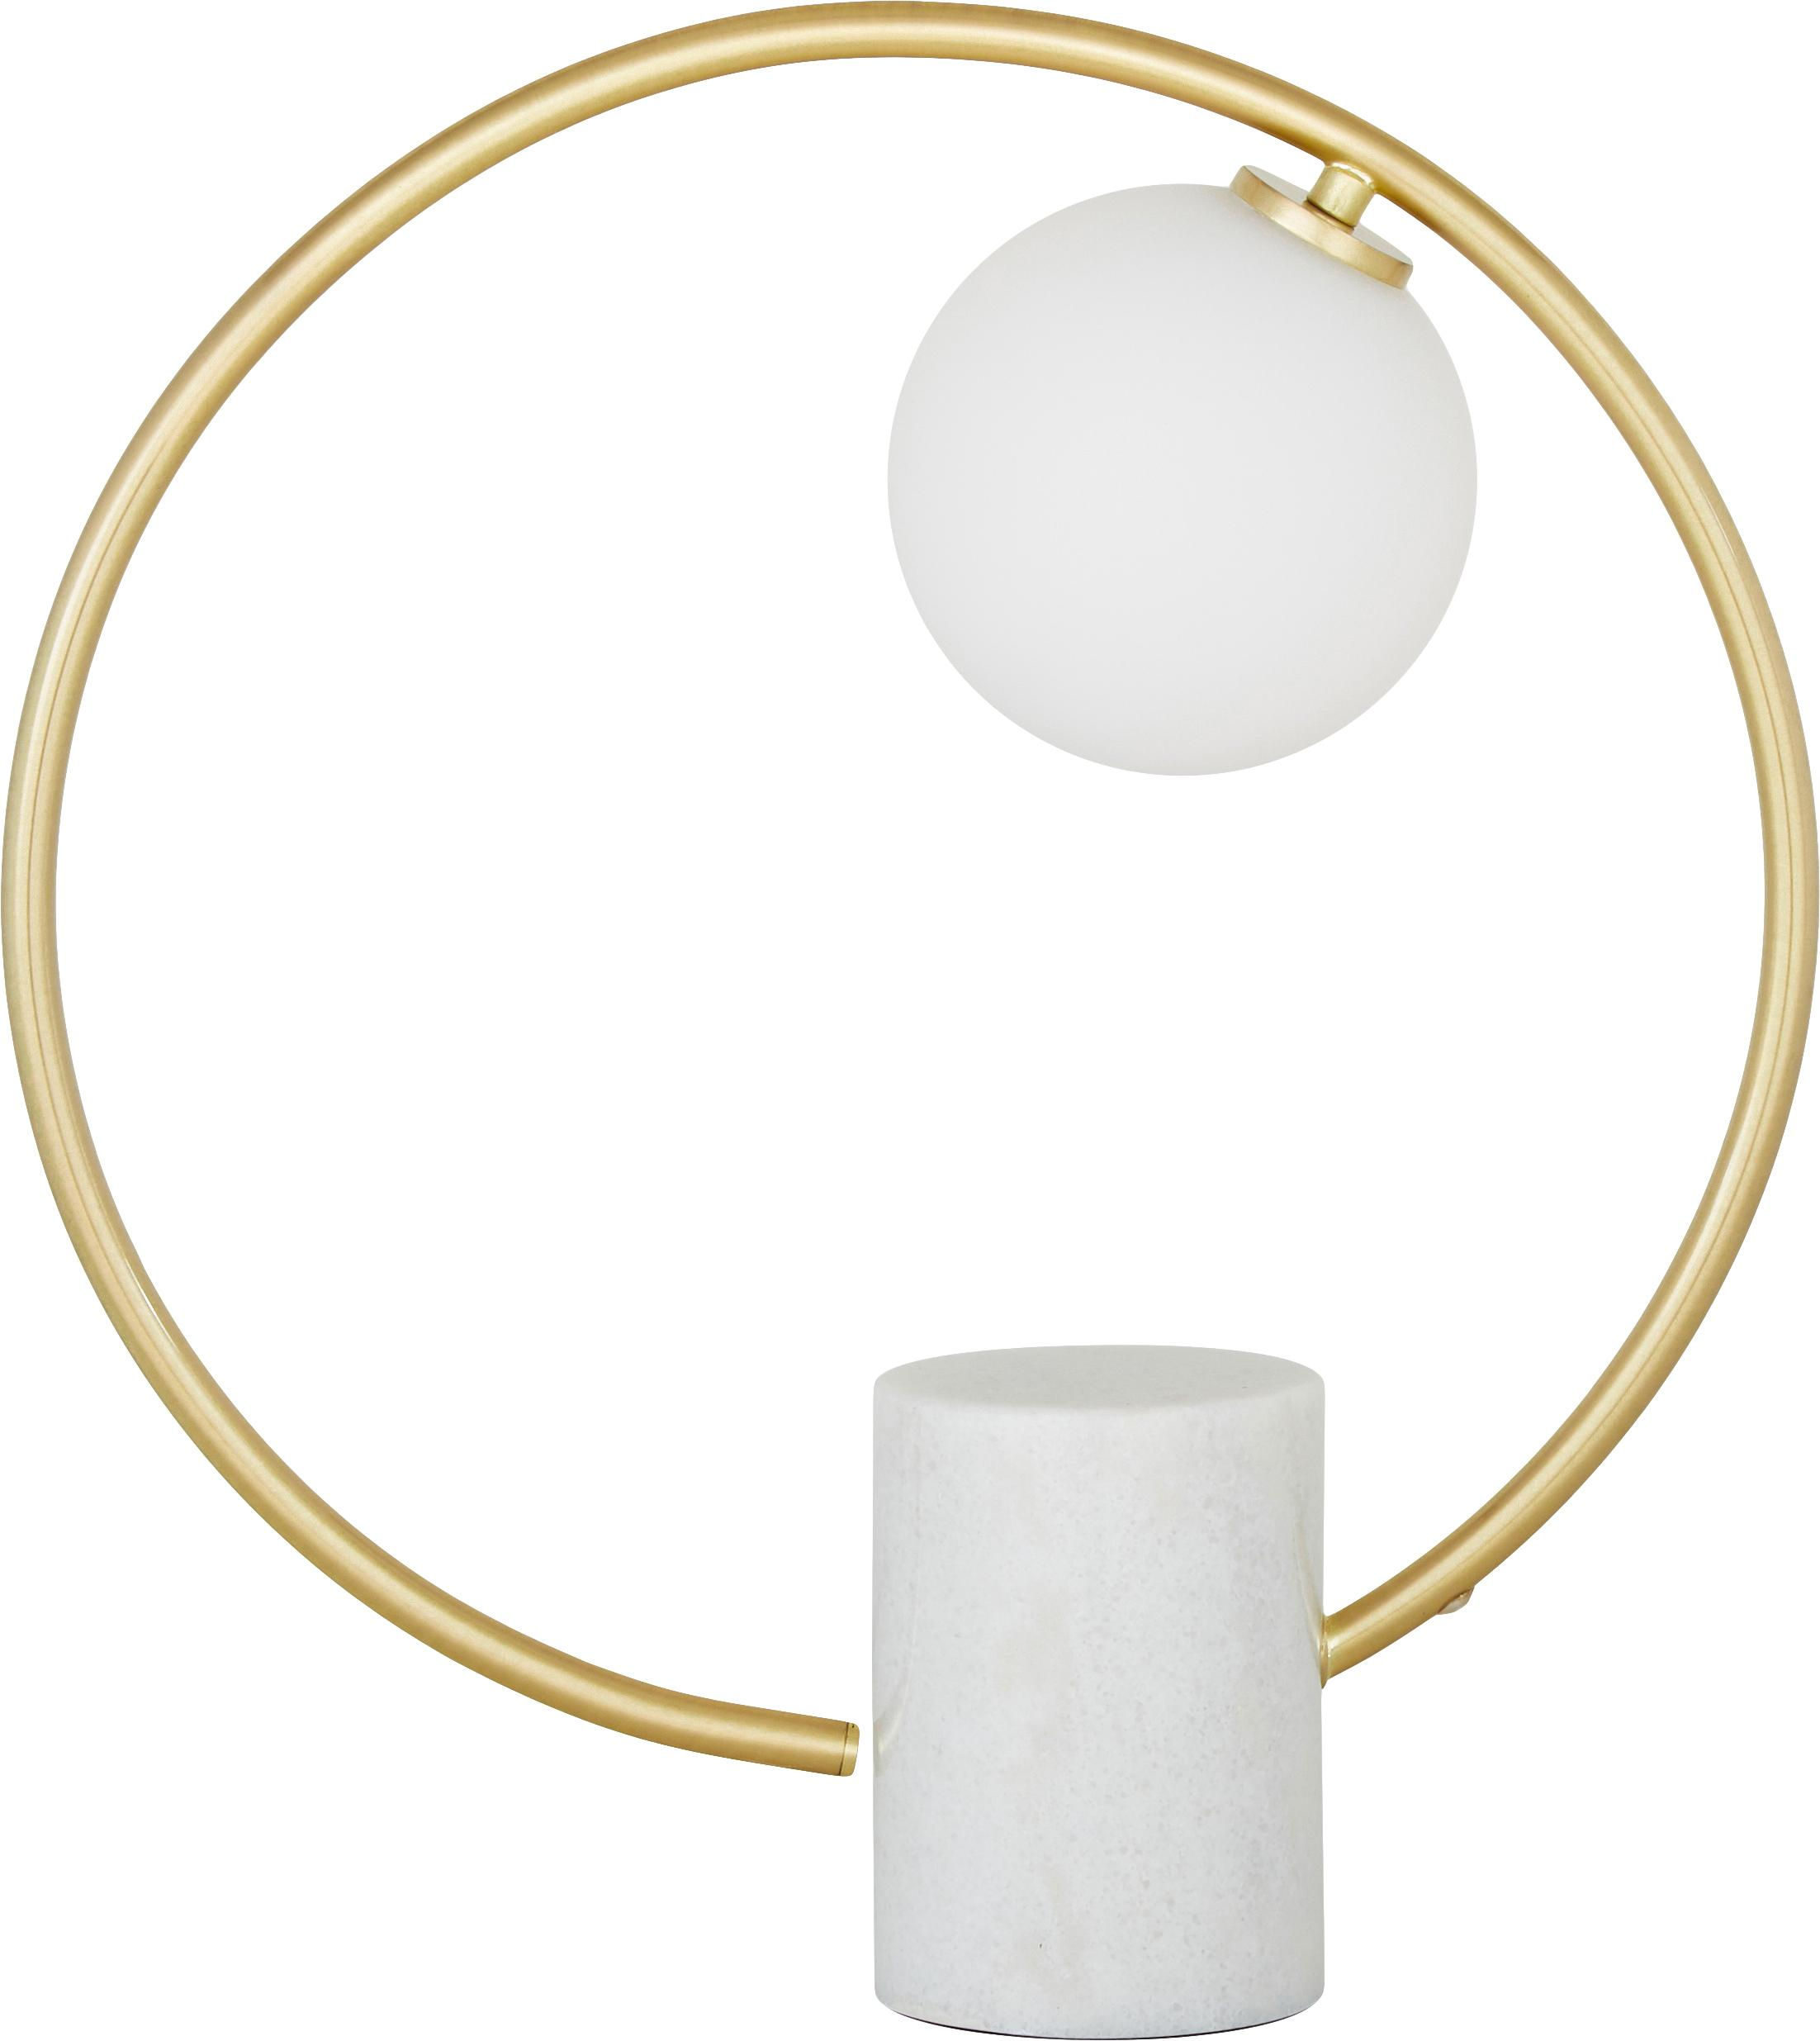 Tafellamp Soho, Lampenkap: glas, Lampvoet: marmer, afwijkingen van f, Frame: vermessingd metaal, Wit, messingkleurig, 40 x 42 cm